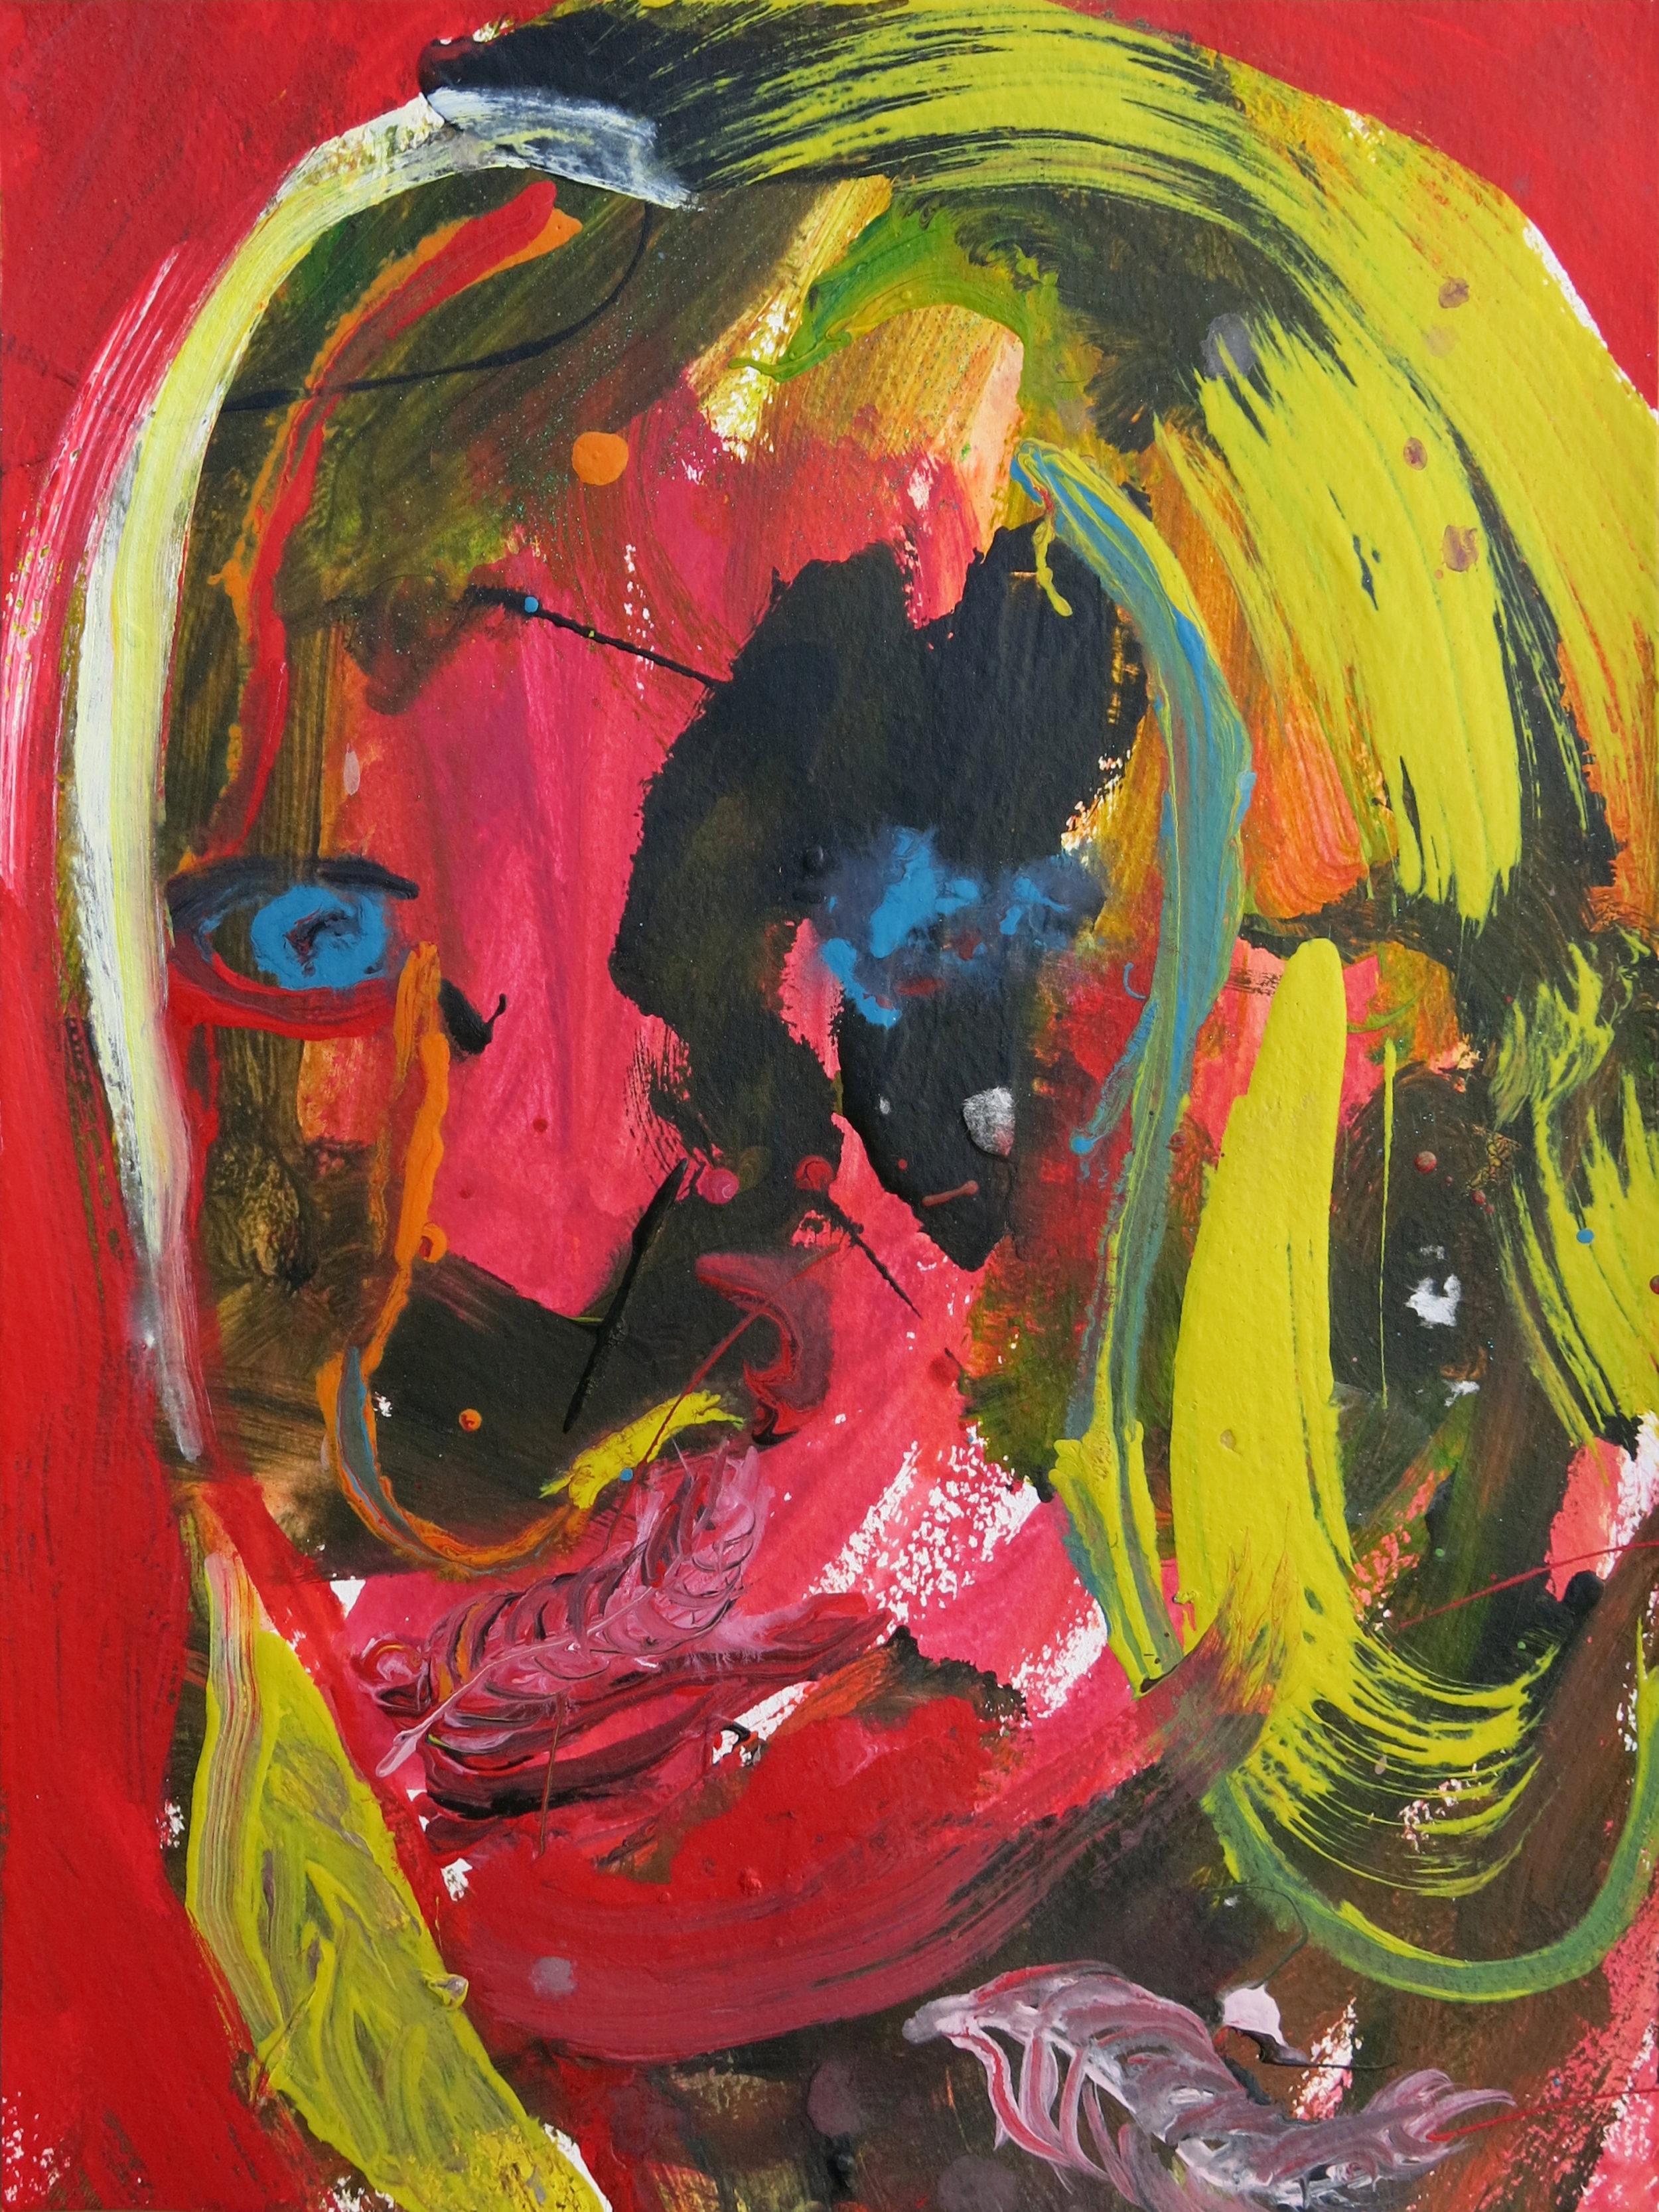 Barbra Streisand Portrait #52